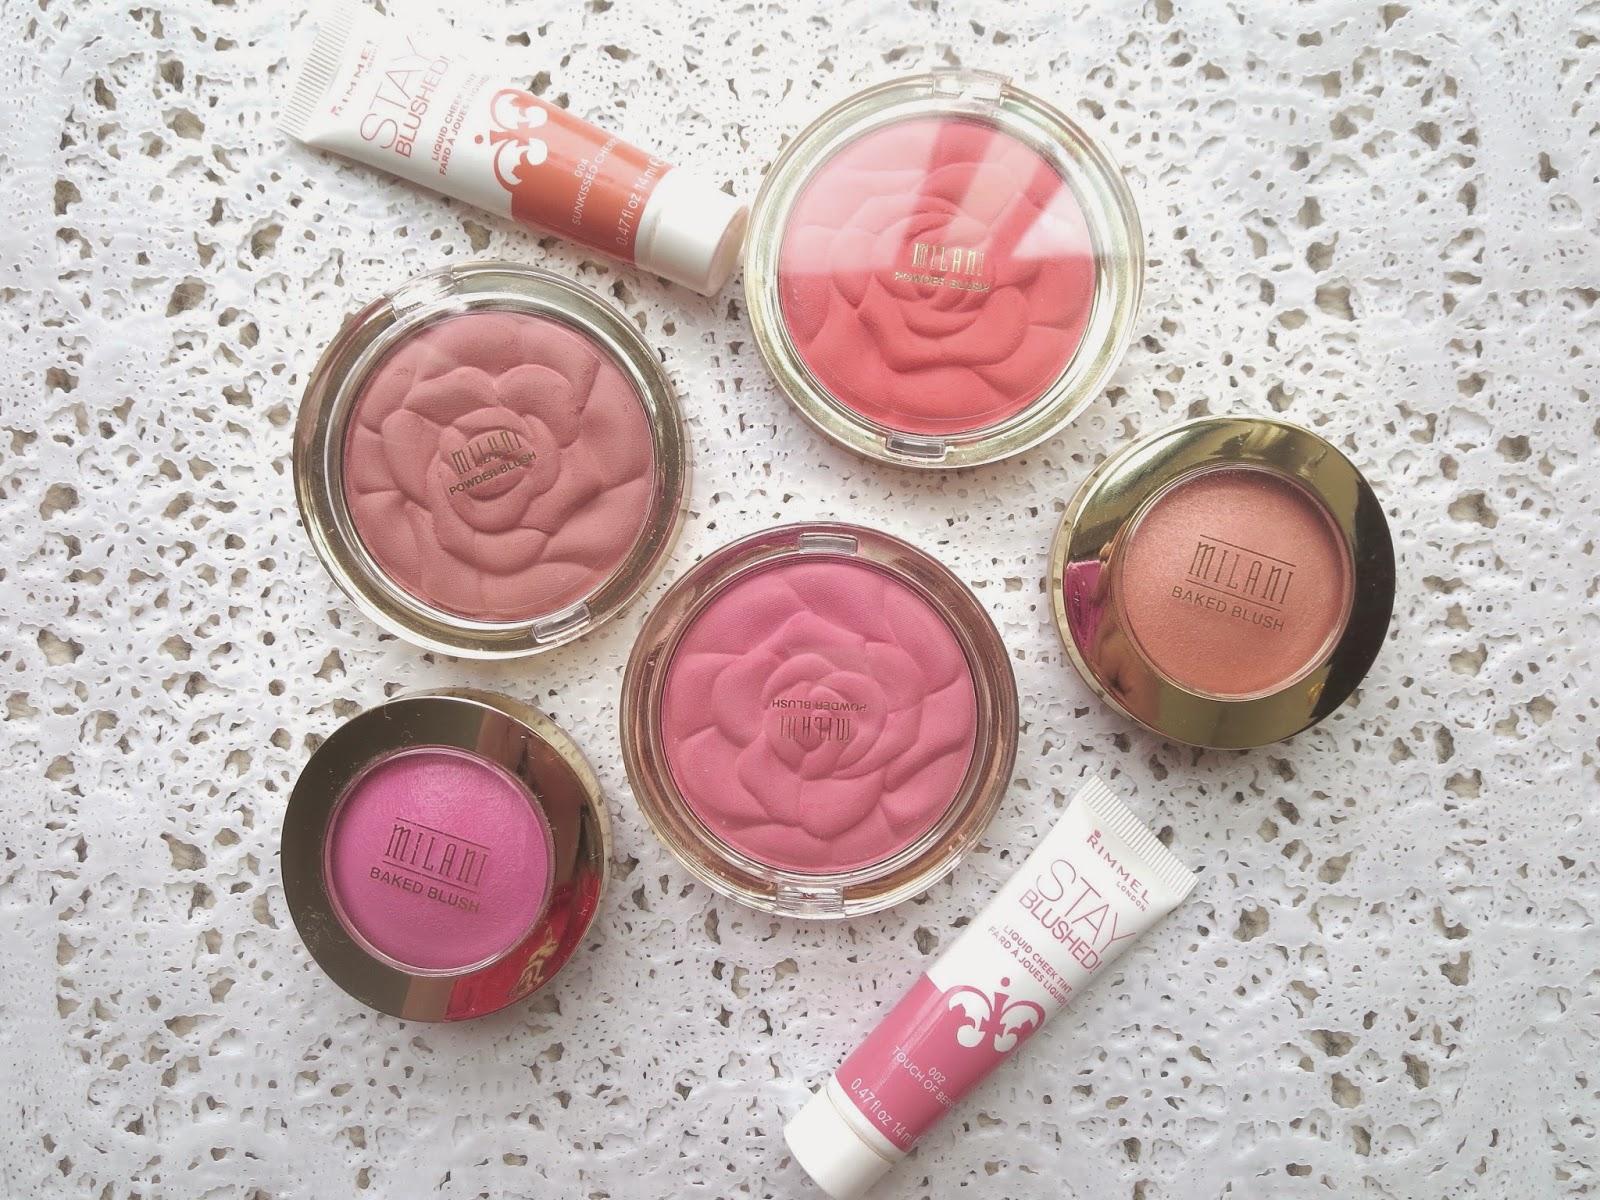 a picture of the best drugstore blushes ; Milani Rose Powder Blush, Milani Baked Blush, Rimmel Stay Blushed